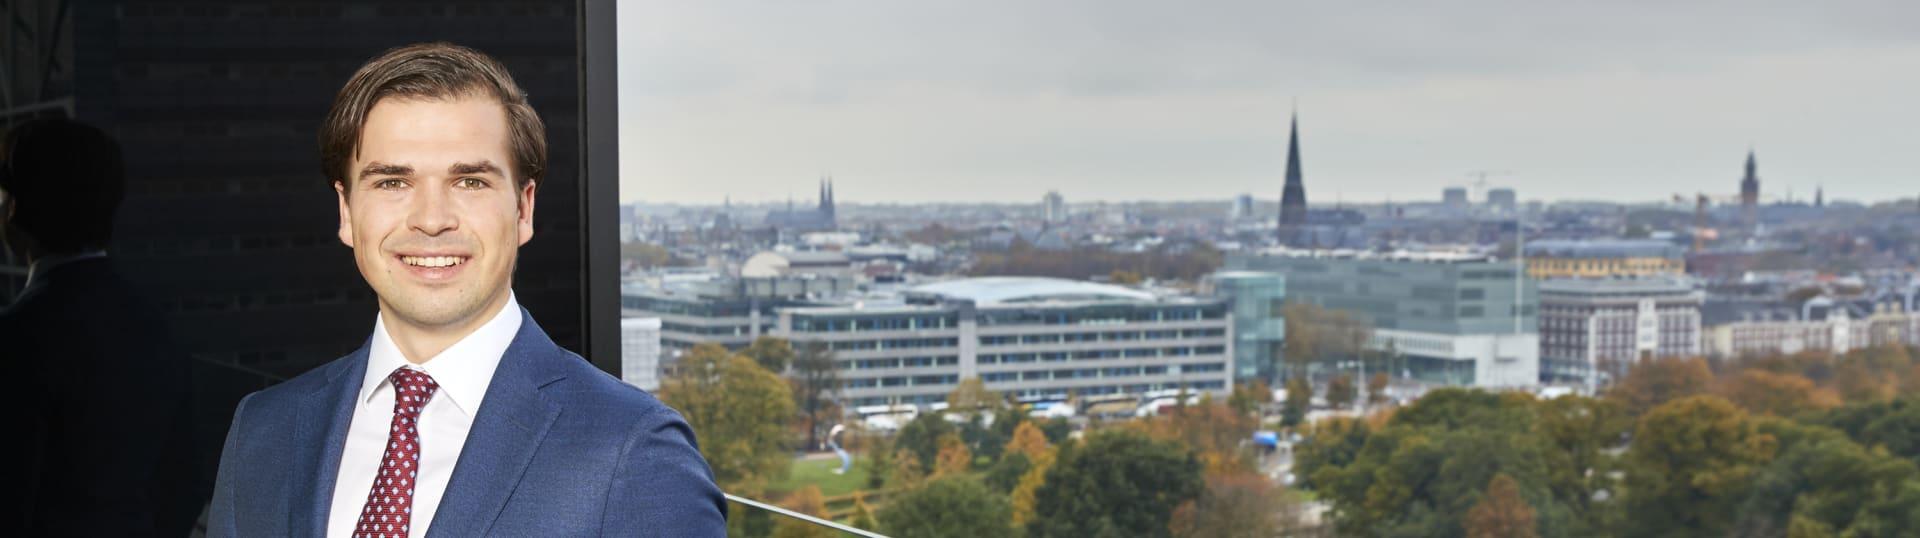 Jasper Cazemier, advocaat Pels Rijcken